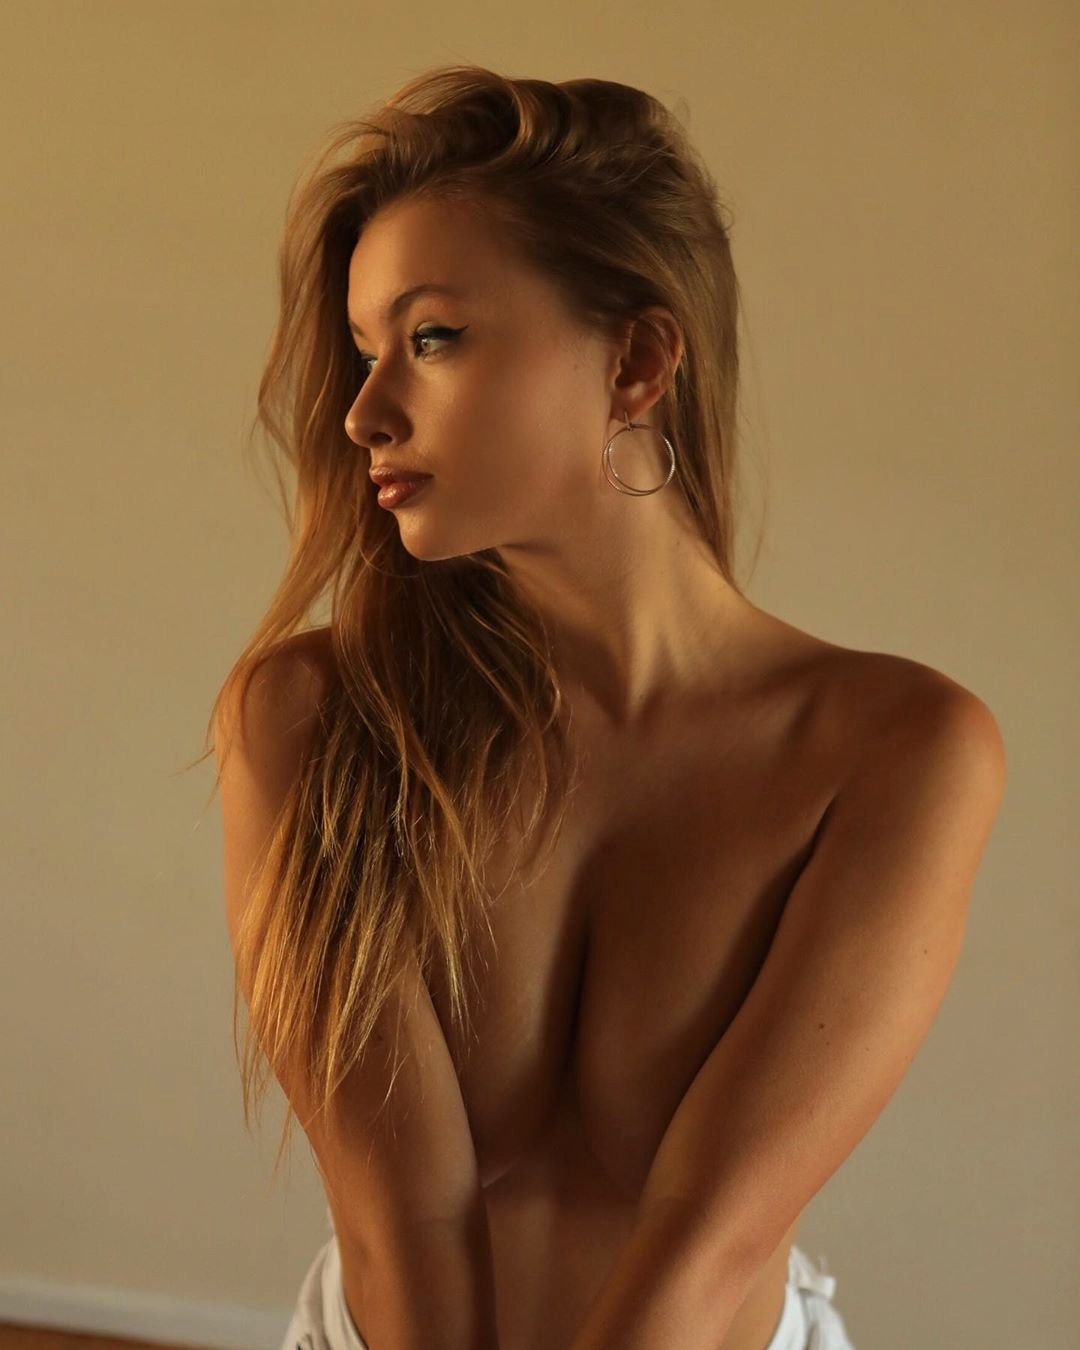 Натали Хадек фото ню, без купальника